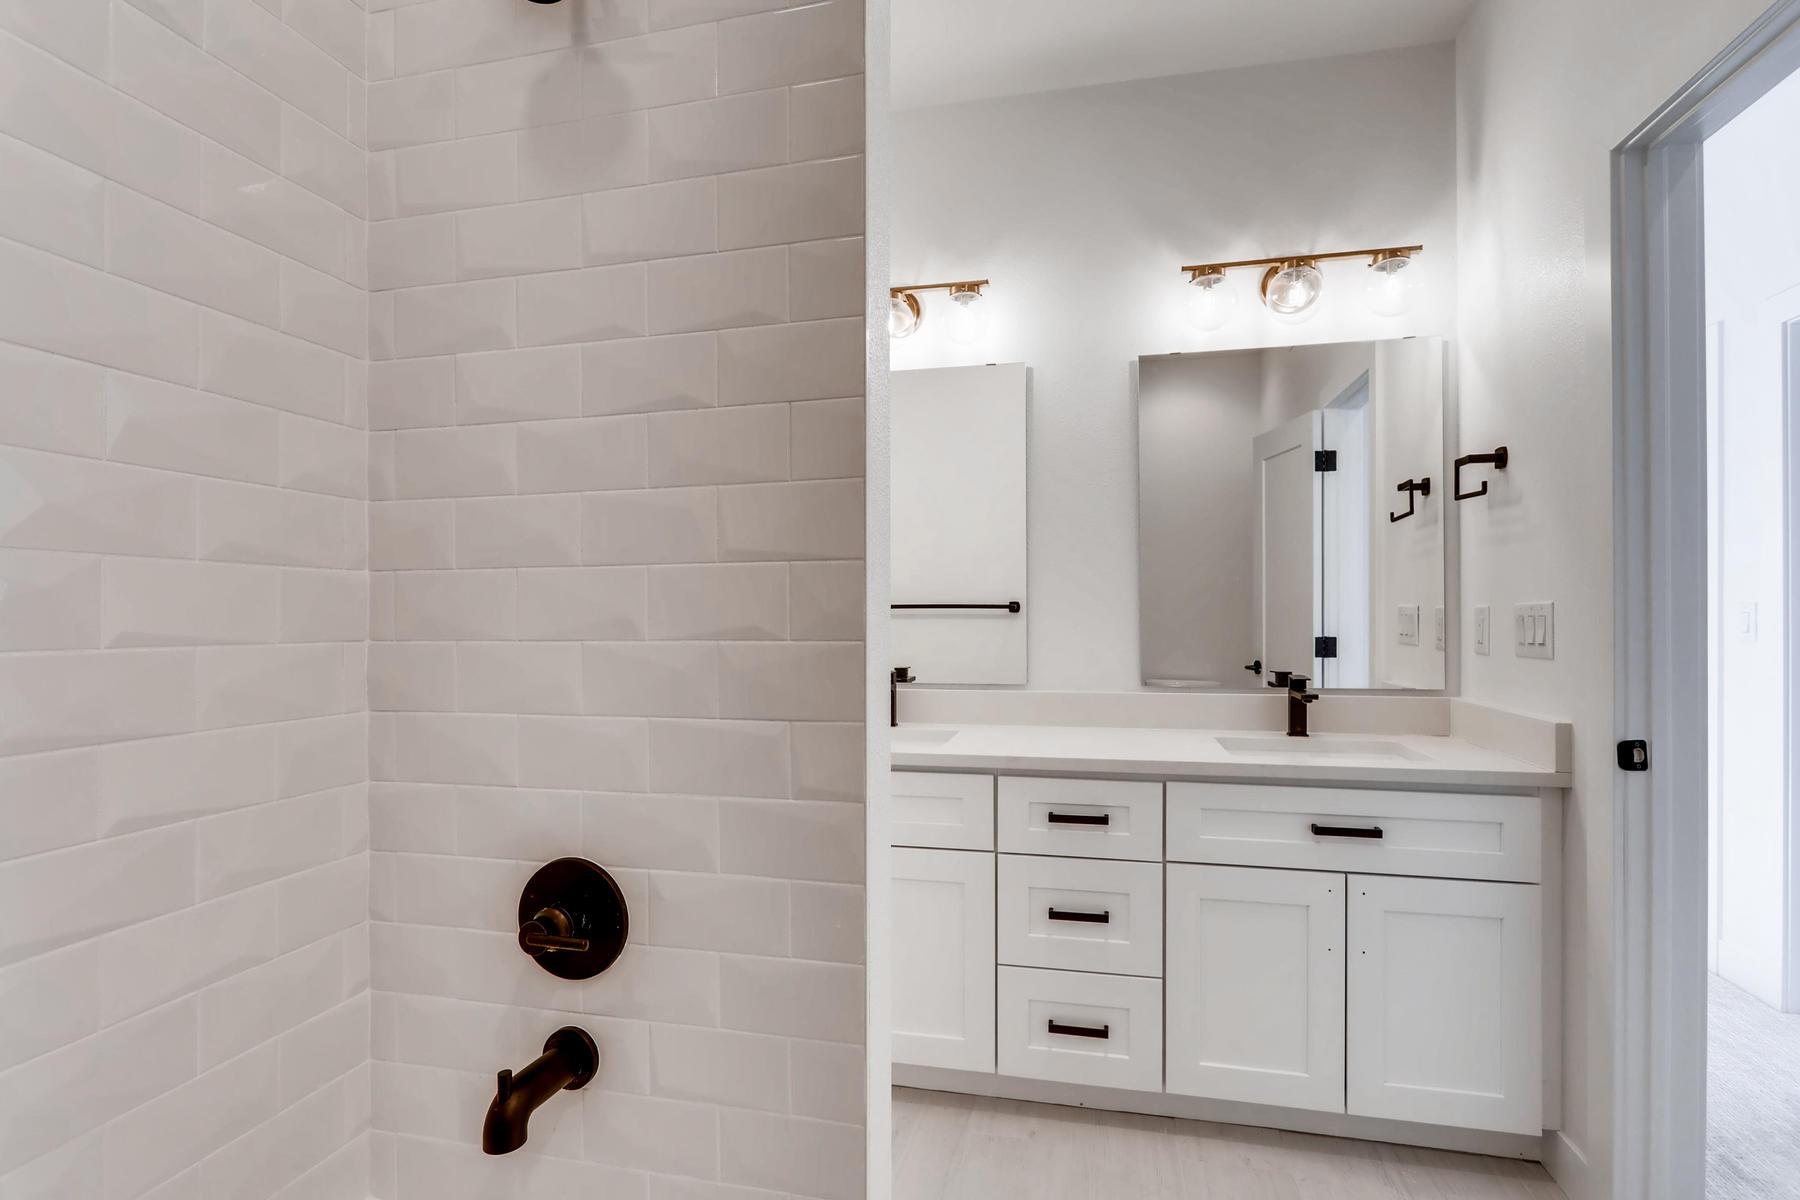 3105 S Cherokee St Englewood-023-18-2nd Floor Bathroom-MLS_Size.jpg